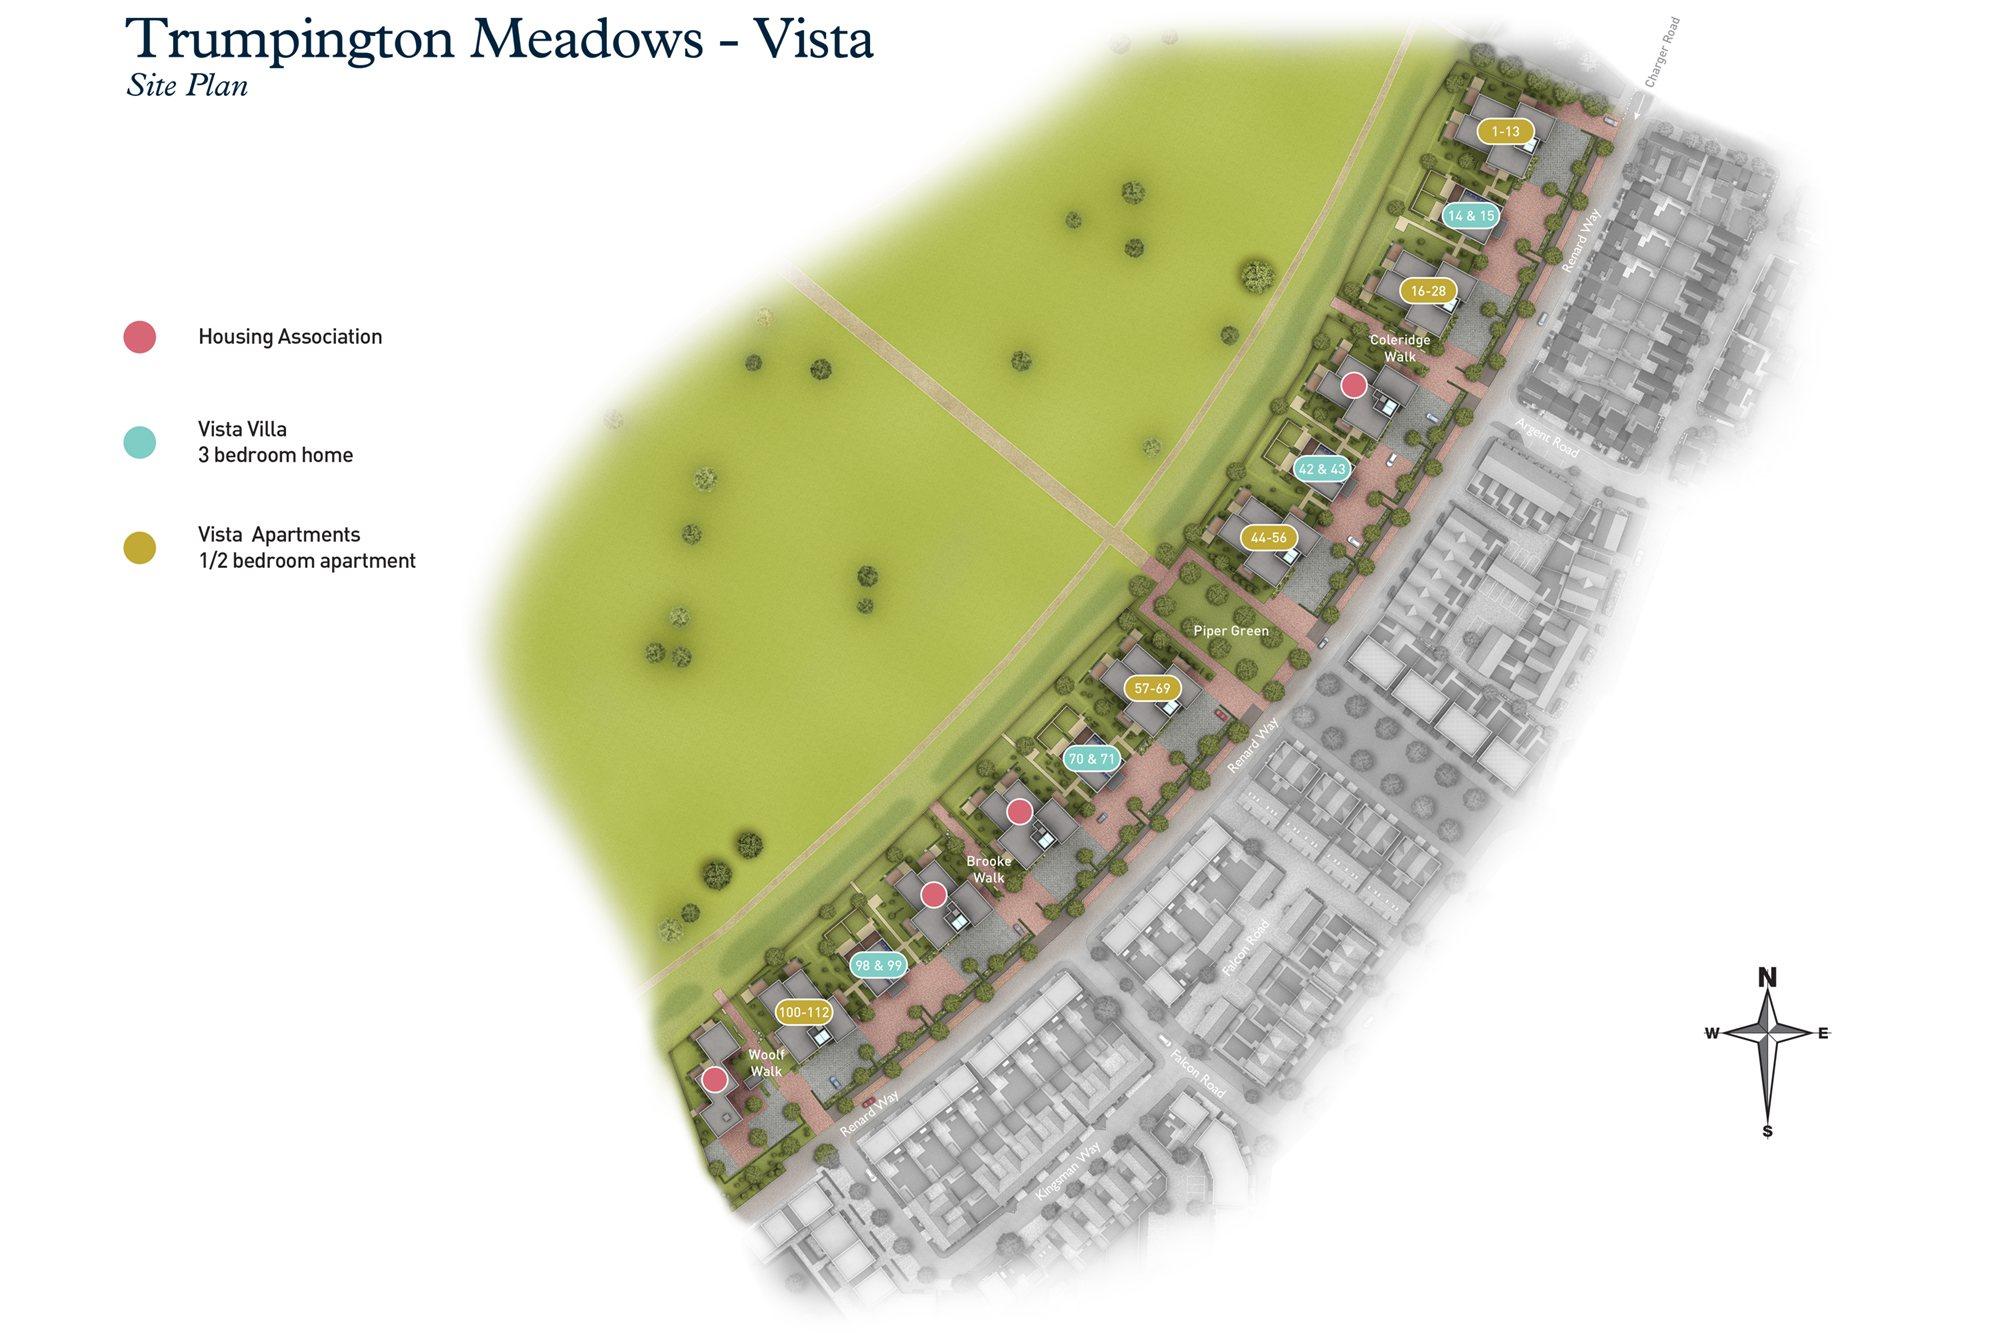 Vista Site Plan